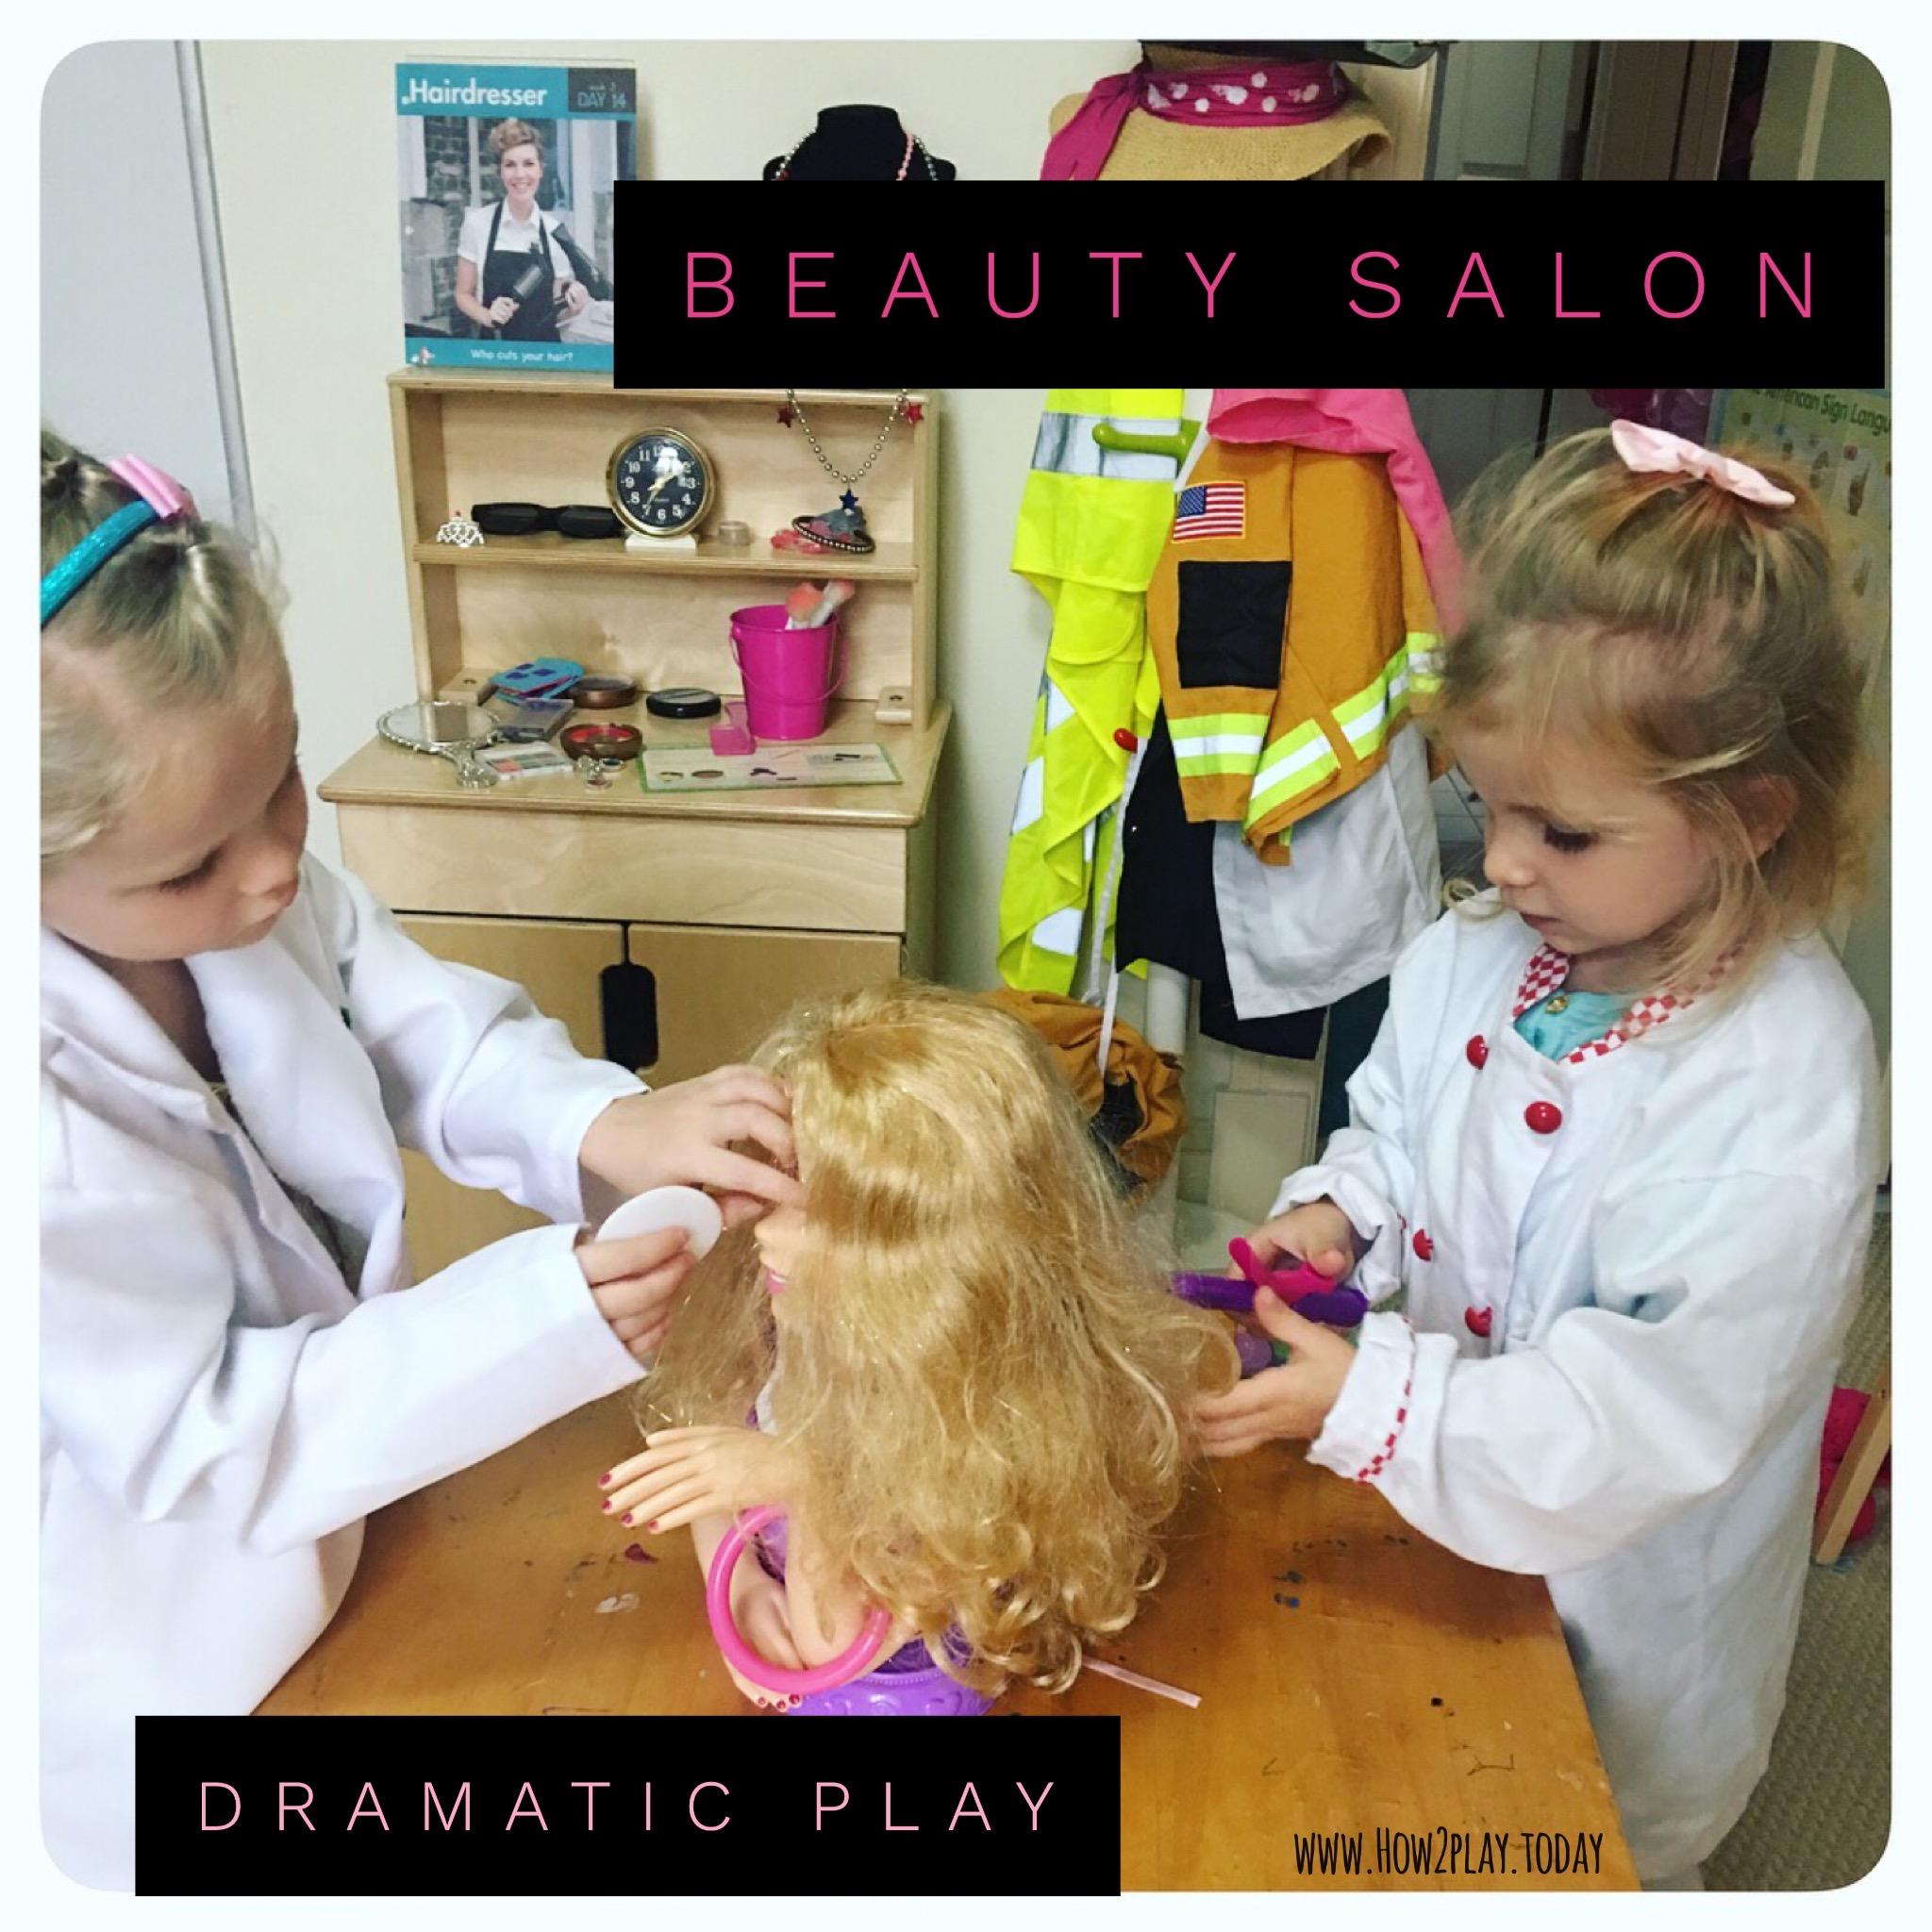 Beauty Salon - Dramatic Play